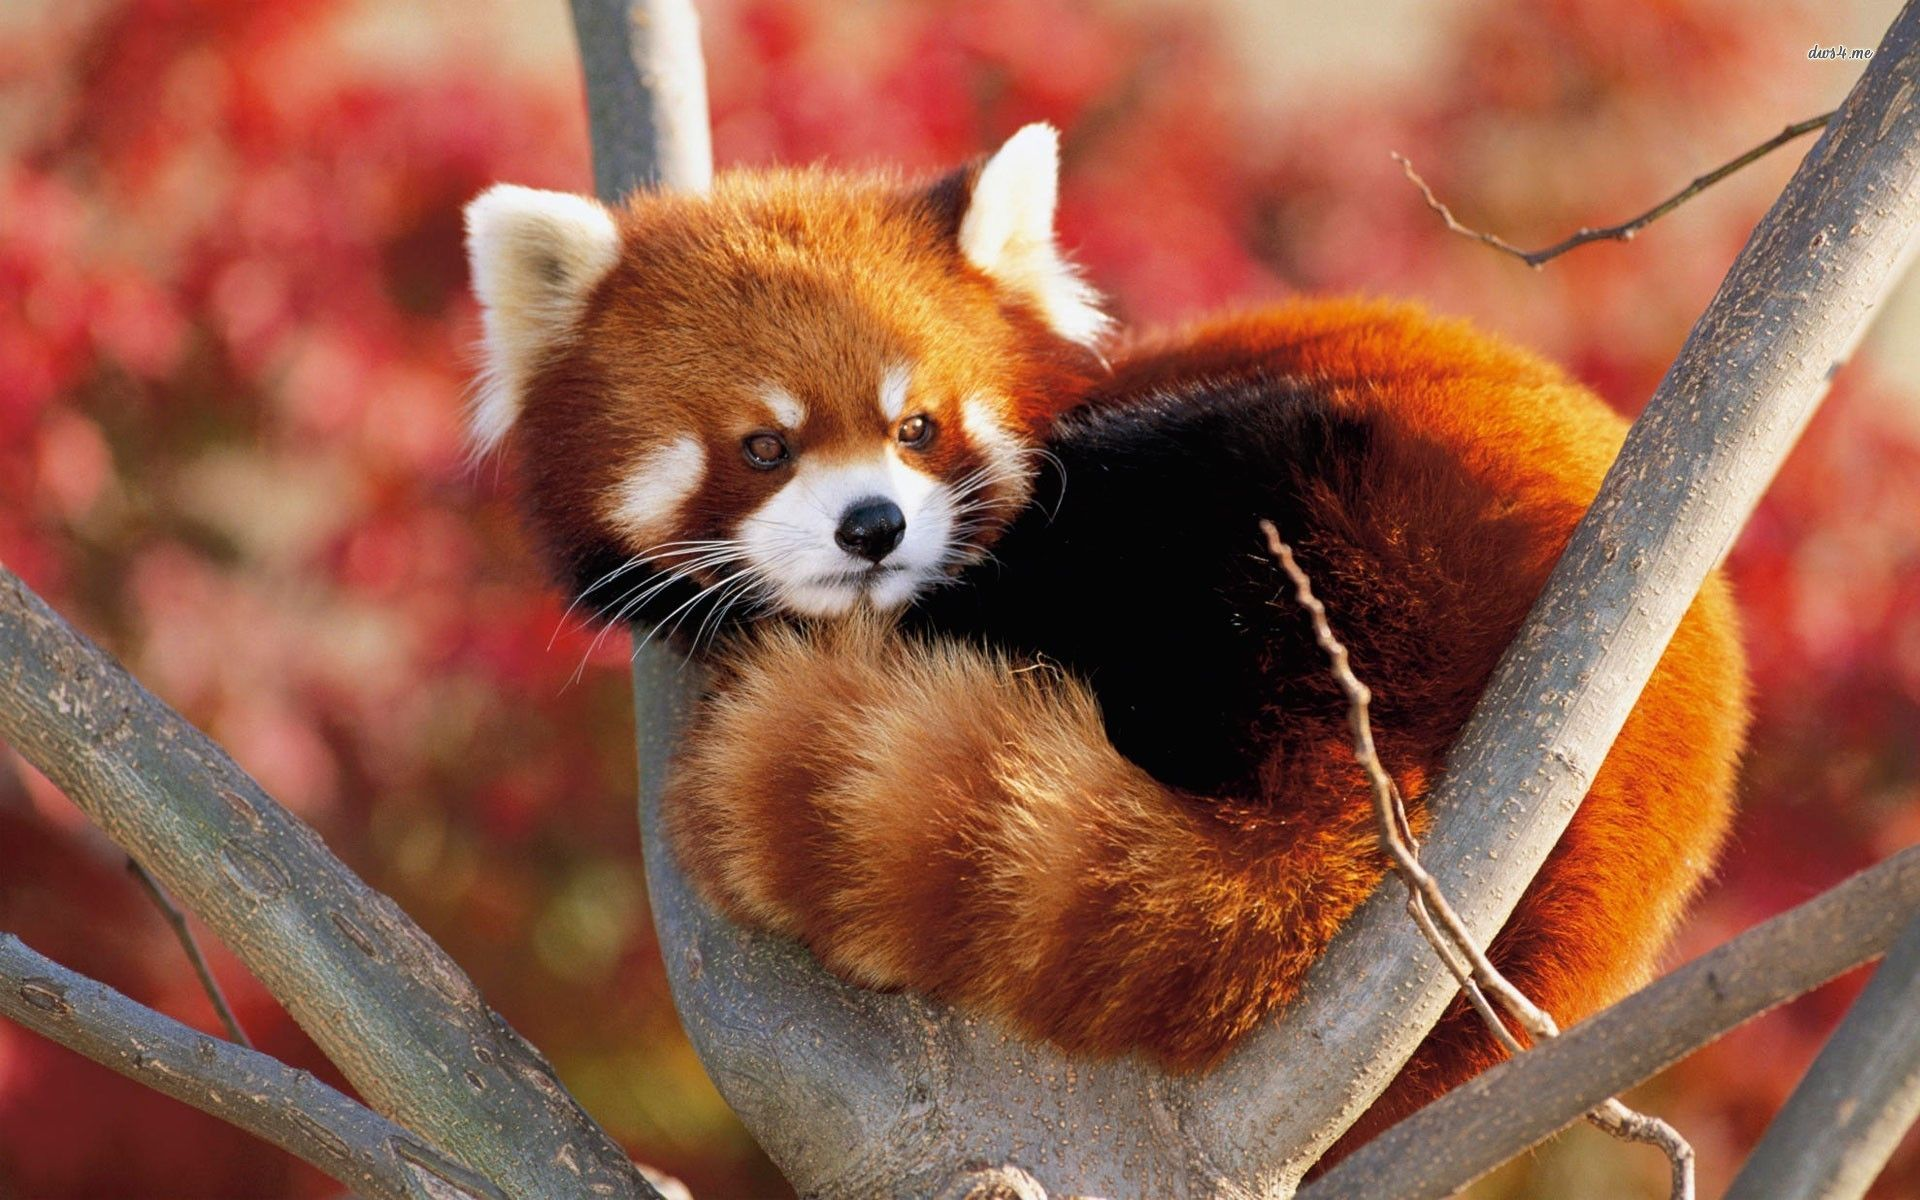 17 Red Pandas To Get You Through Finals Red Panda Cute Red Panda Red Panda Baby